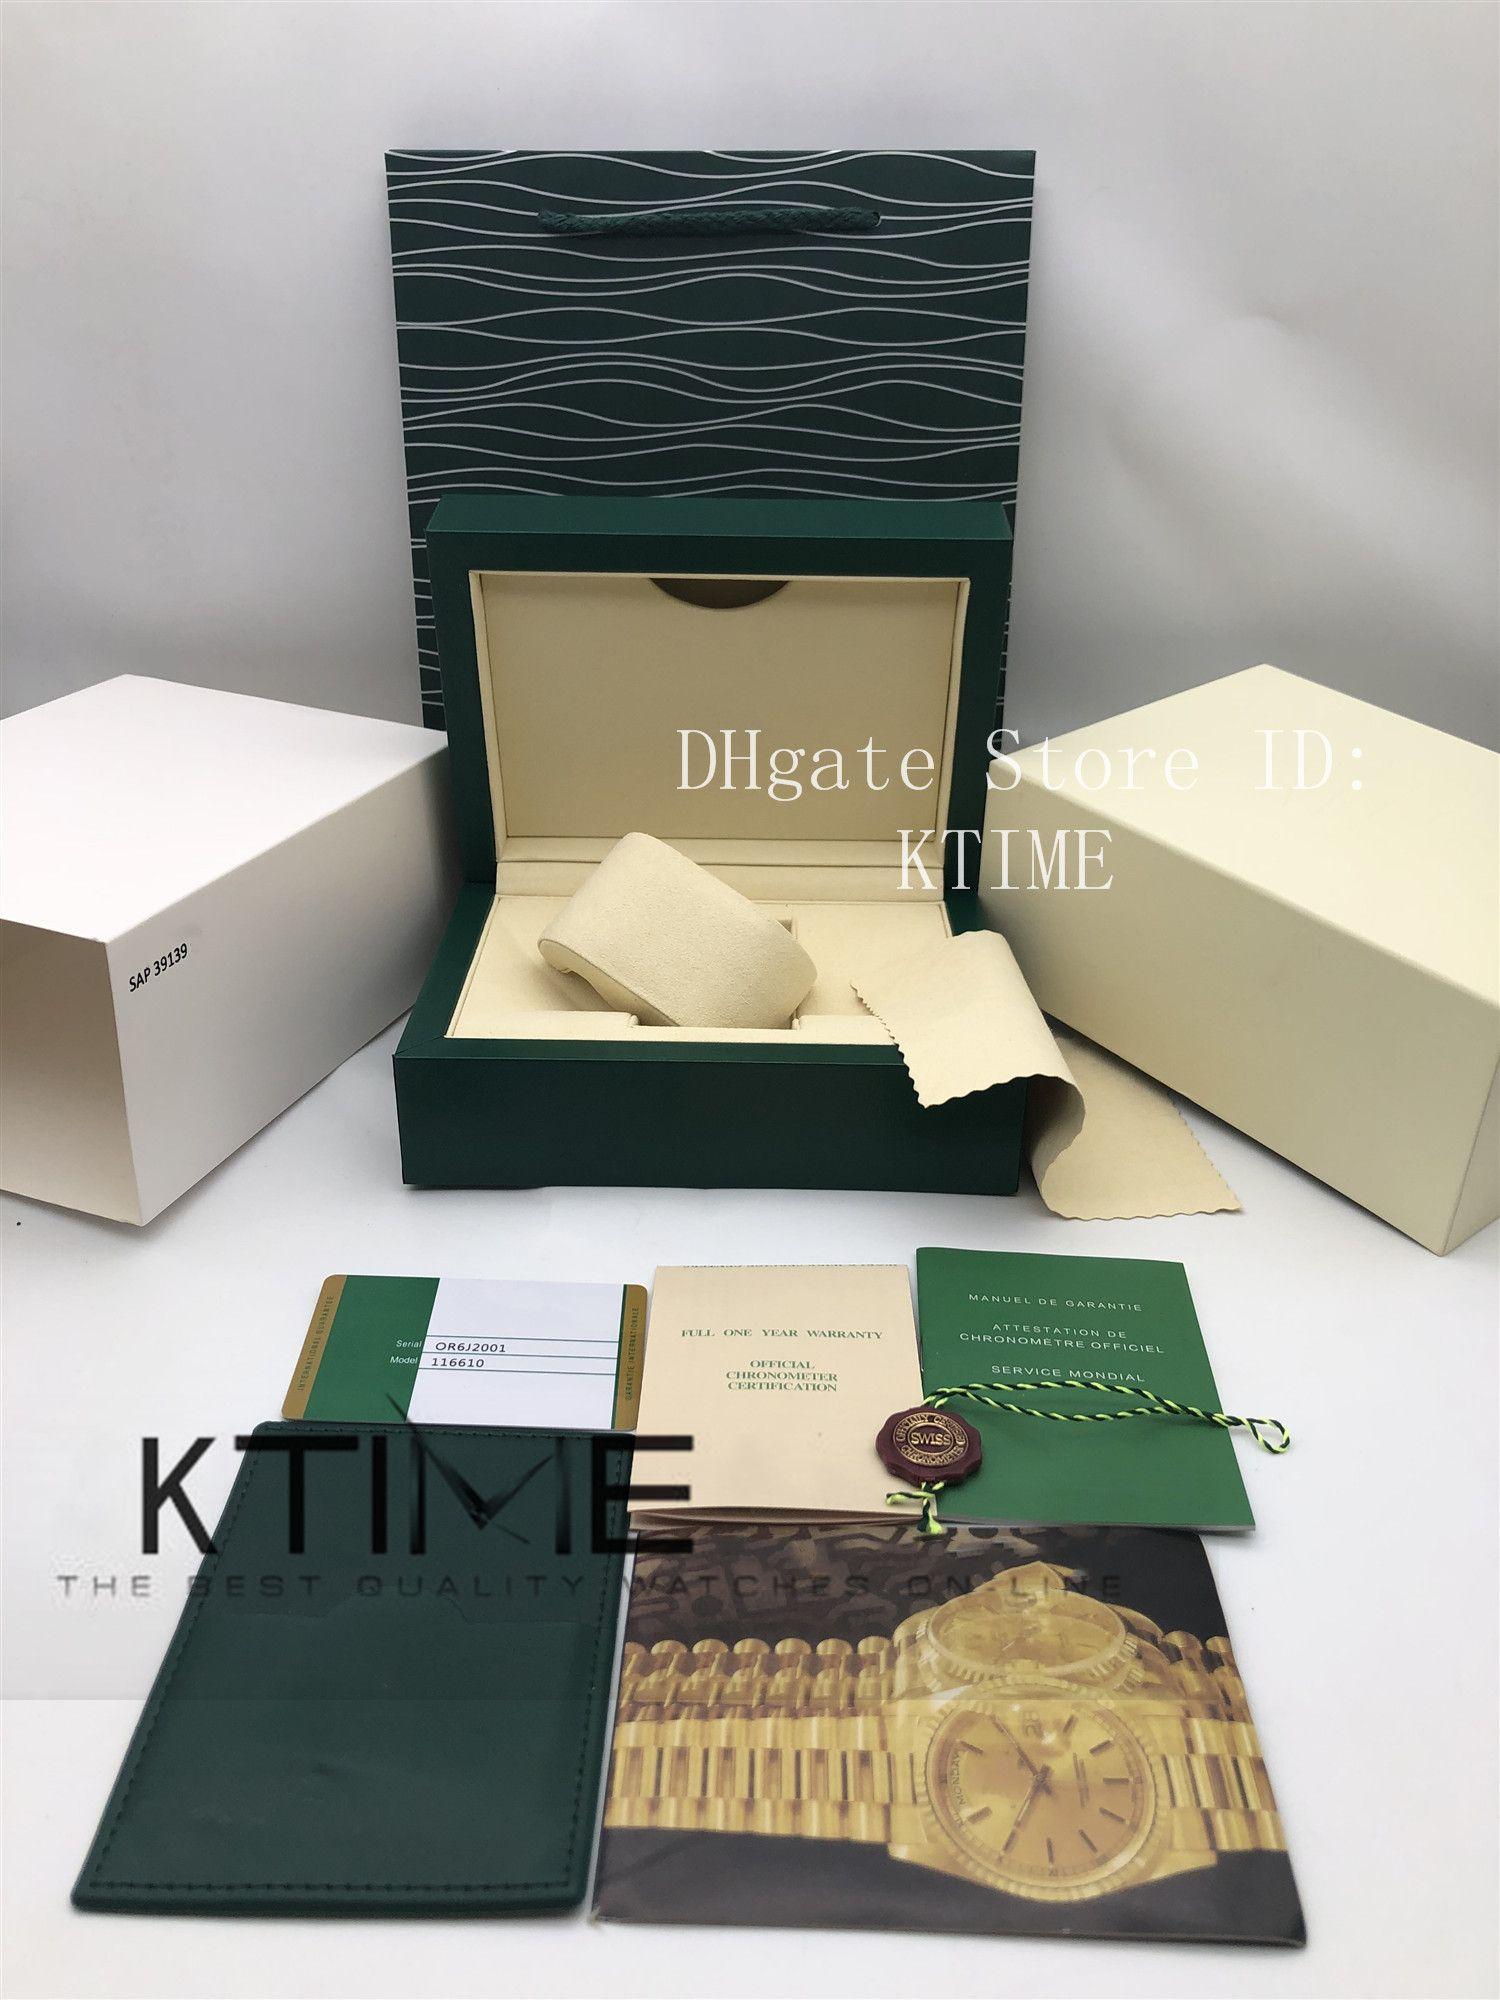 Mejor calidad superior verde oscuro reloj Caja de regalo de madera de embalaje caso para Rolex 116610 Caja de folletos tarjeta de Etiquetas y papeles Wipe Caja de reloj de tela Relojes